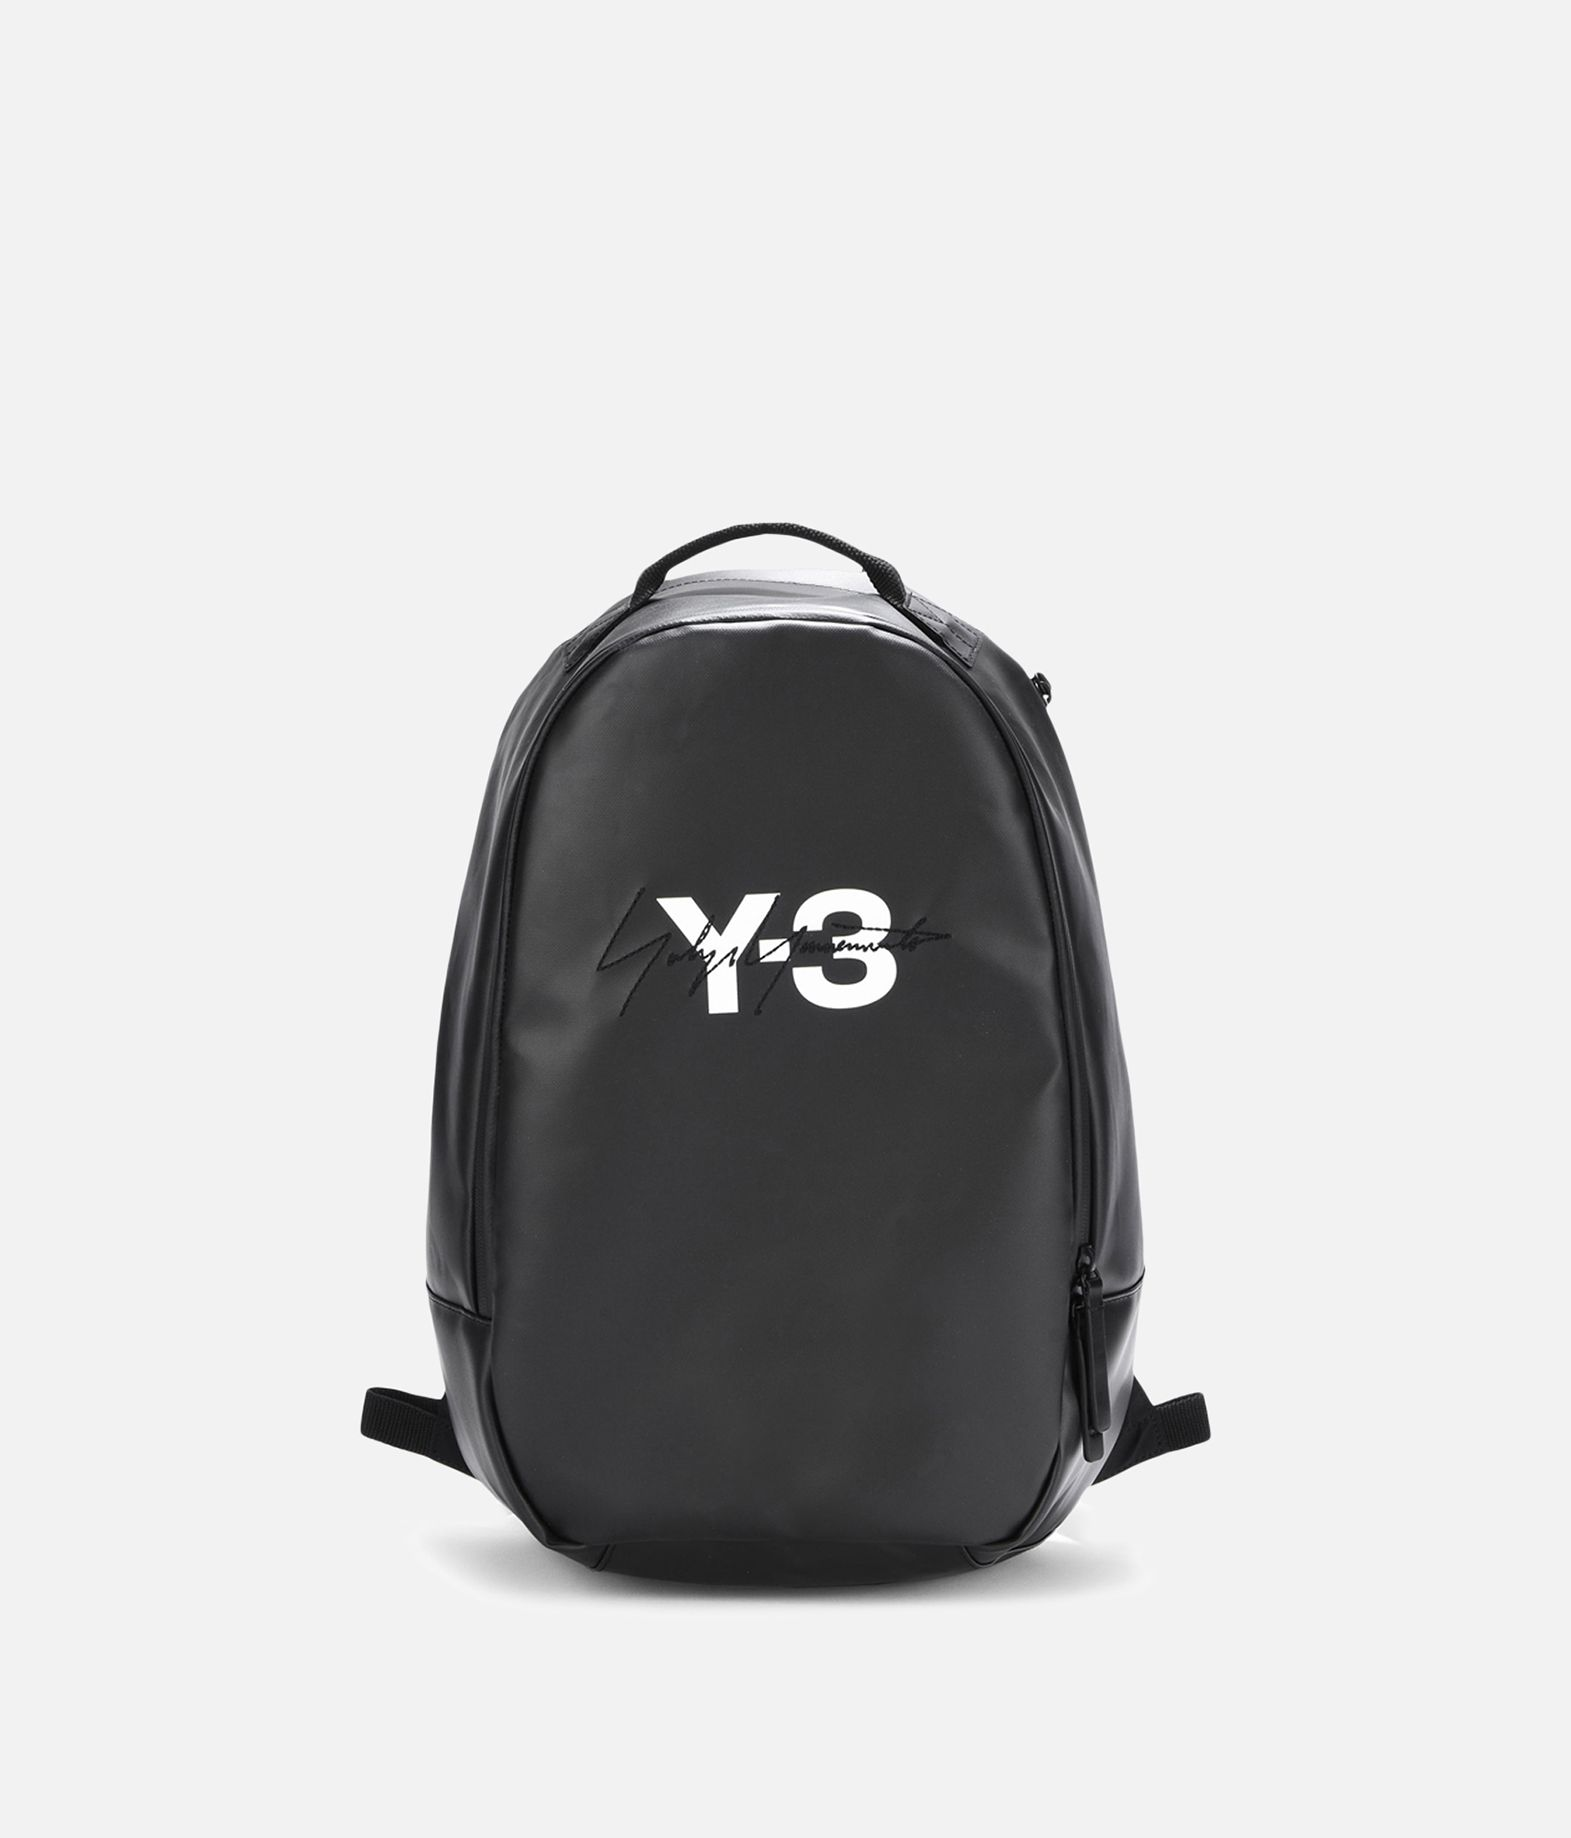 aecb6dca8651 ... Y-3 Y-3 Logo Backpack Backpack E f ...